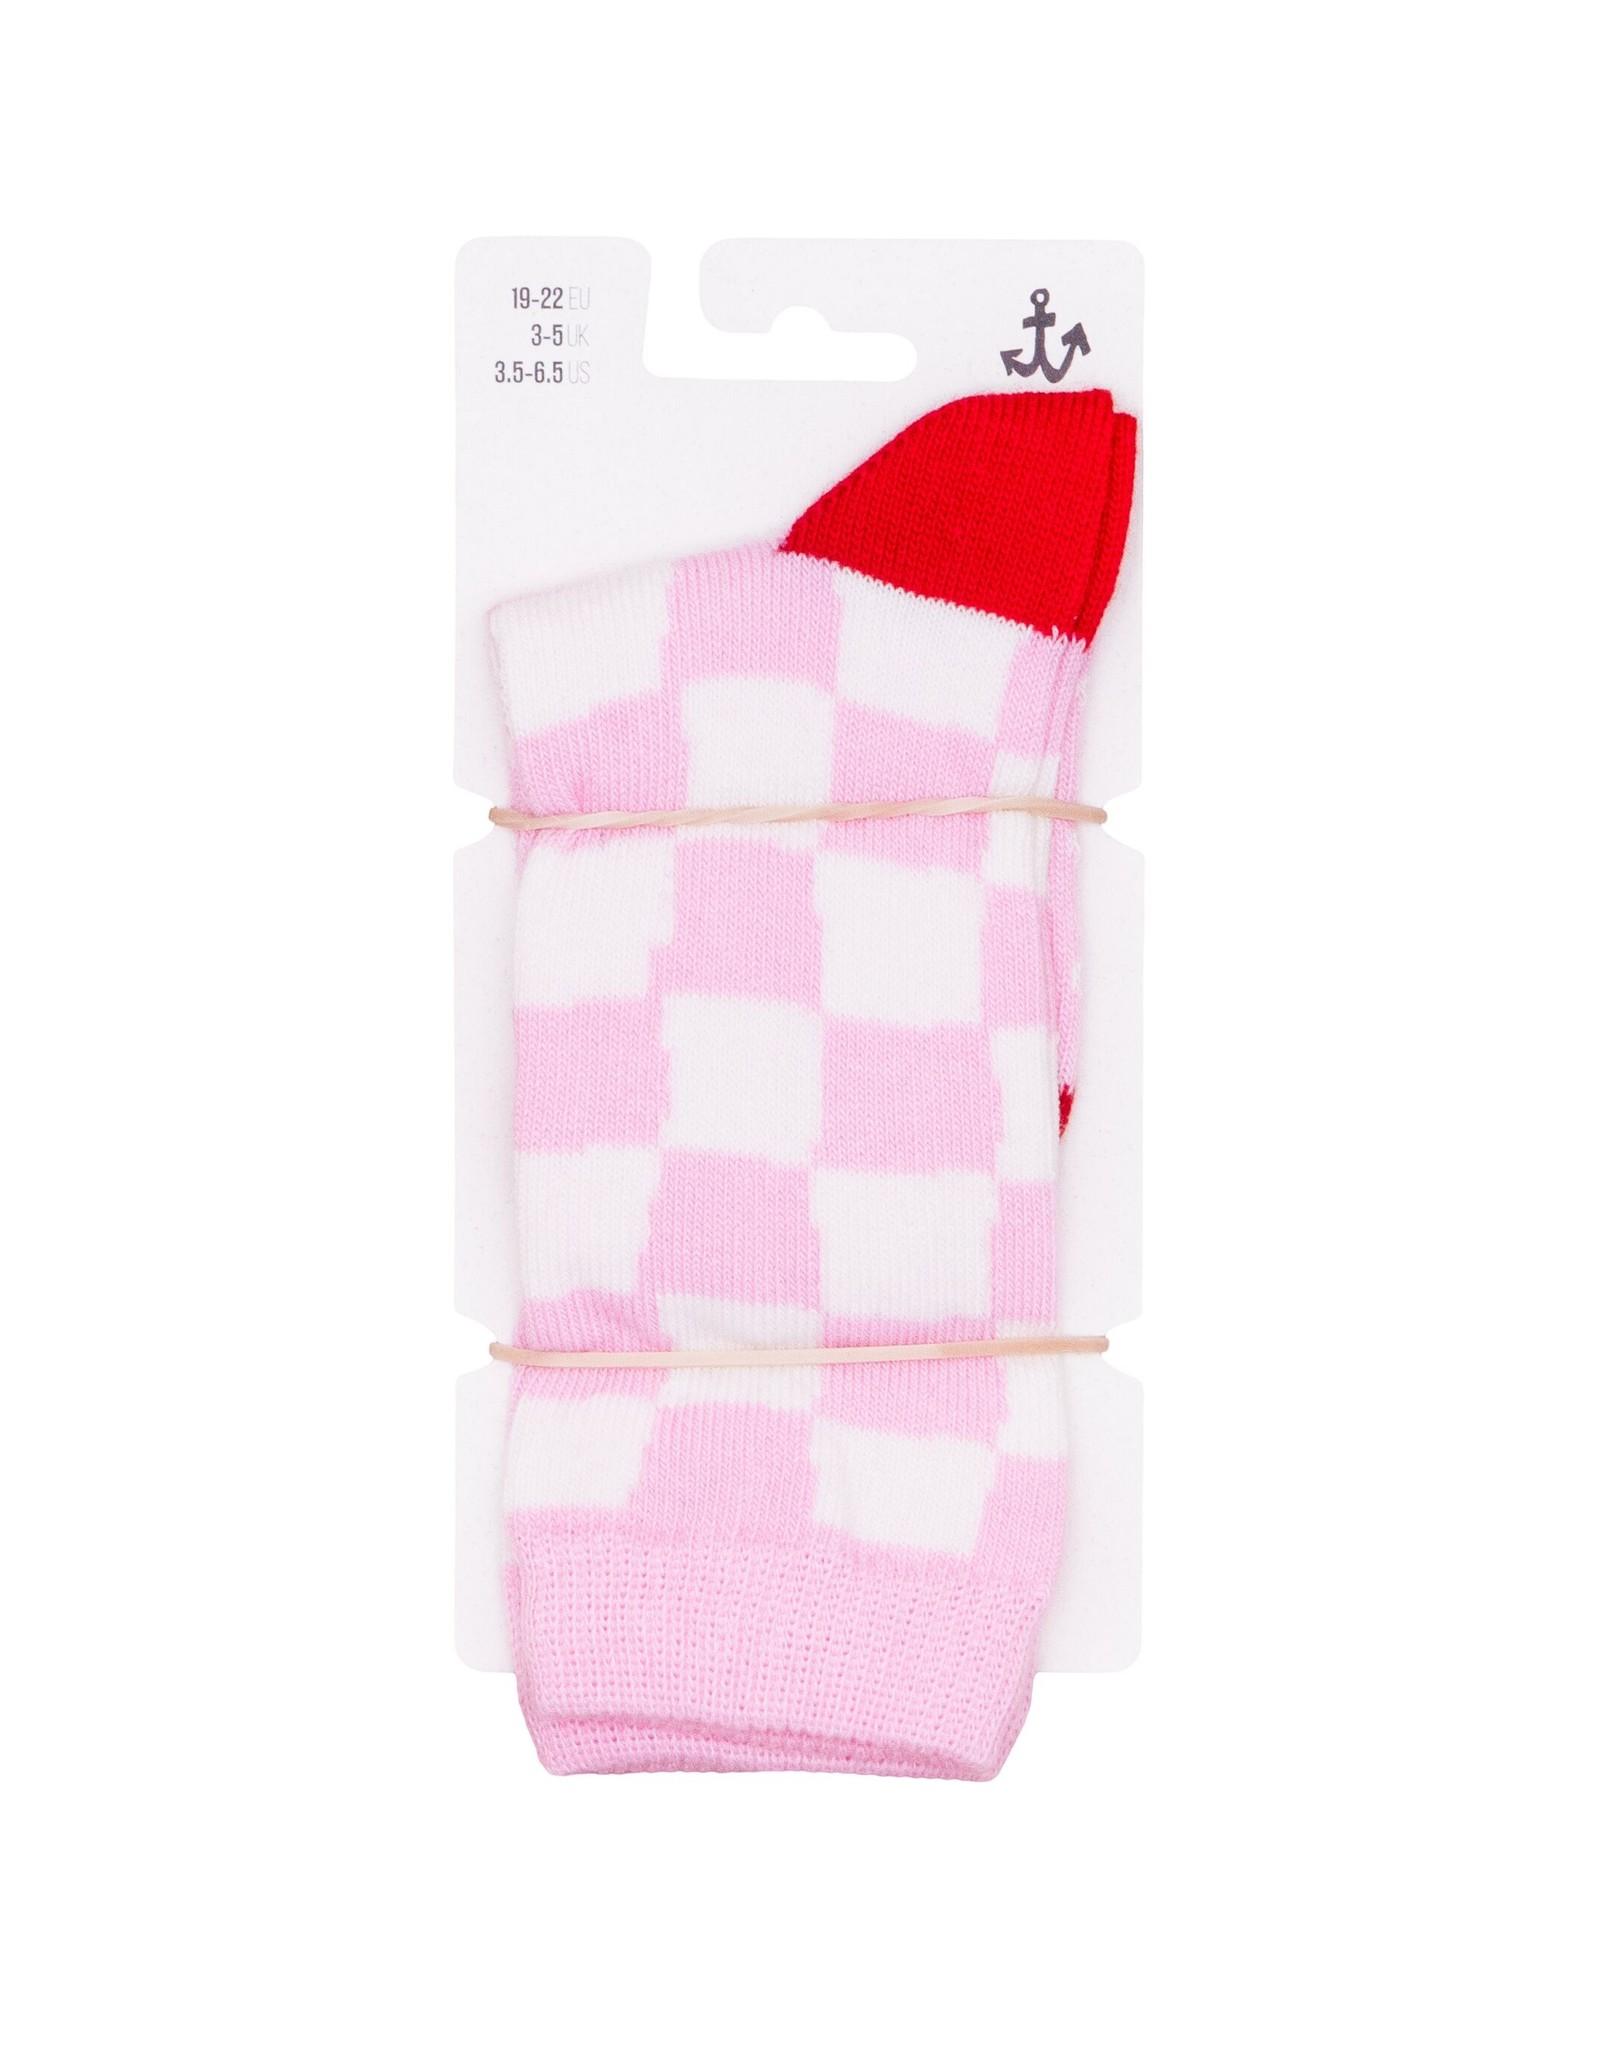 Noé & Zoë crew socks- pink checker